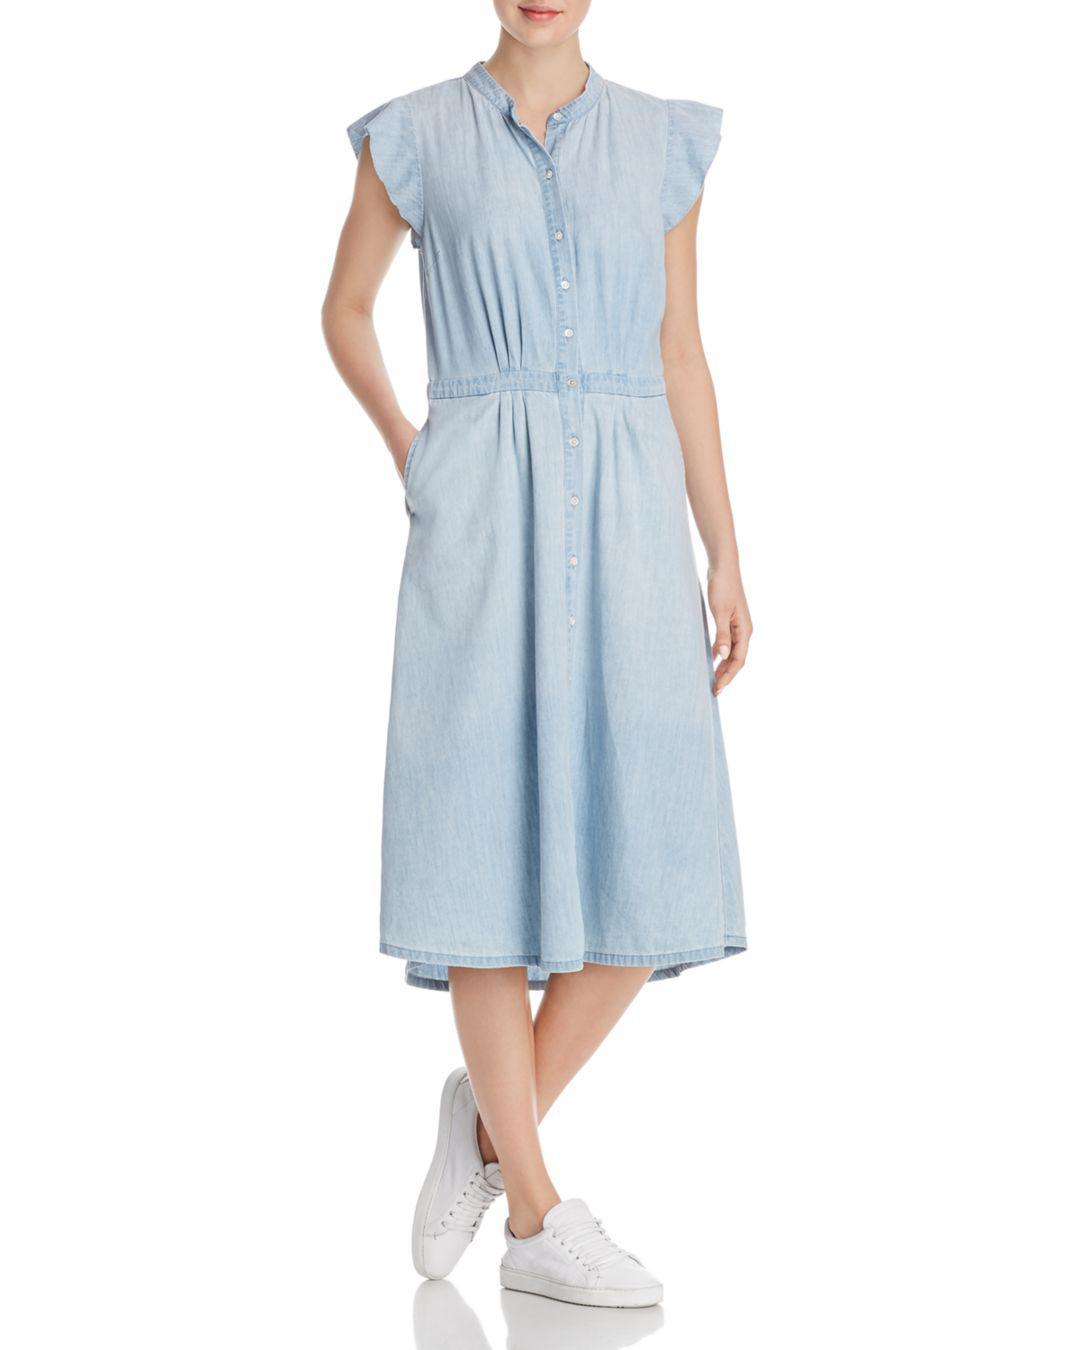 ffb6ac2080 Lyst - Joie Awel Chambray Shirt Dress in Blue